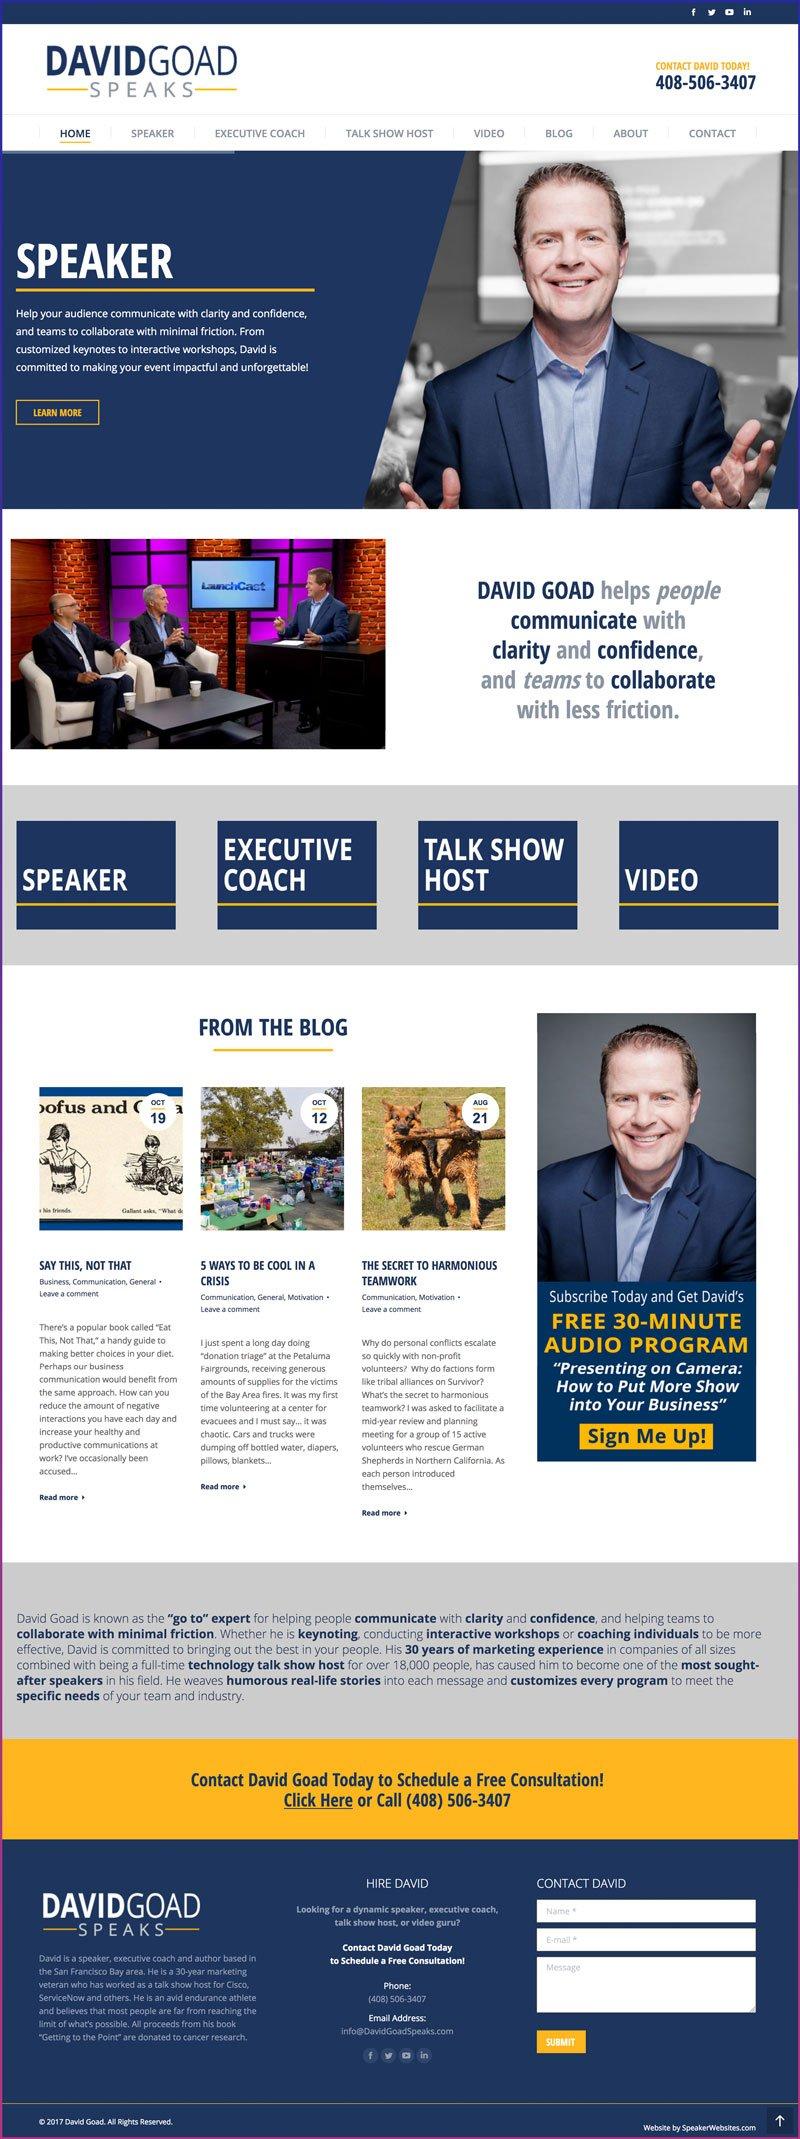 David Goad, Speaker, Executive Coach, Talk Show Host